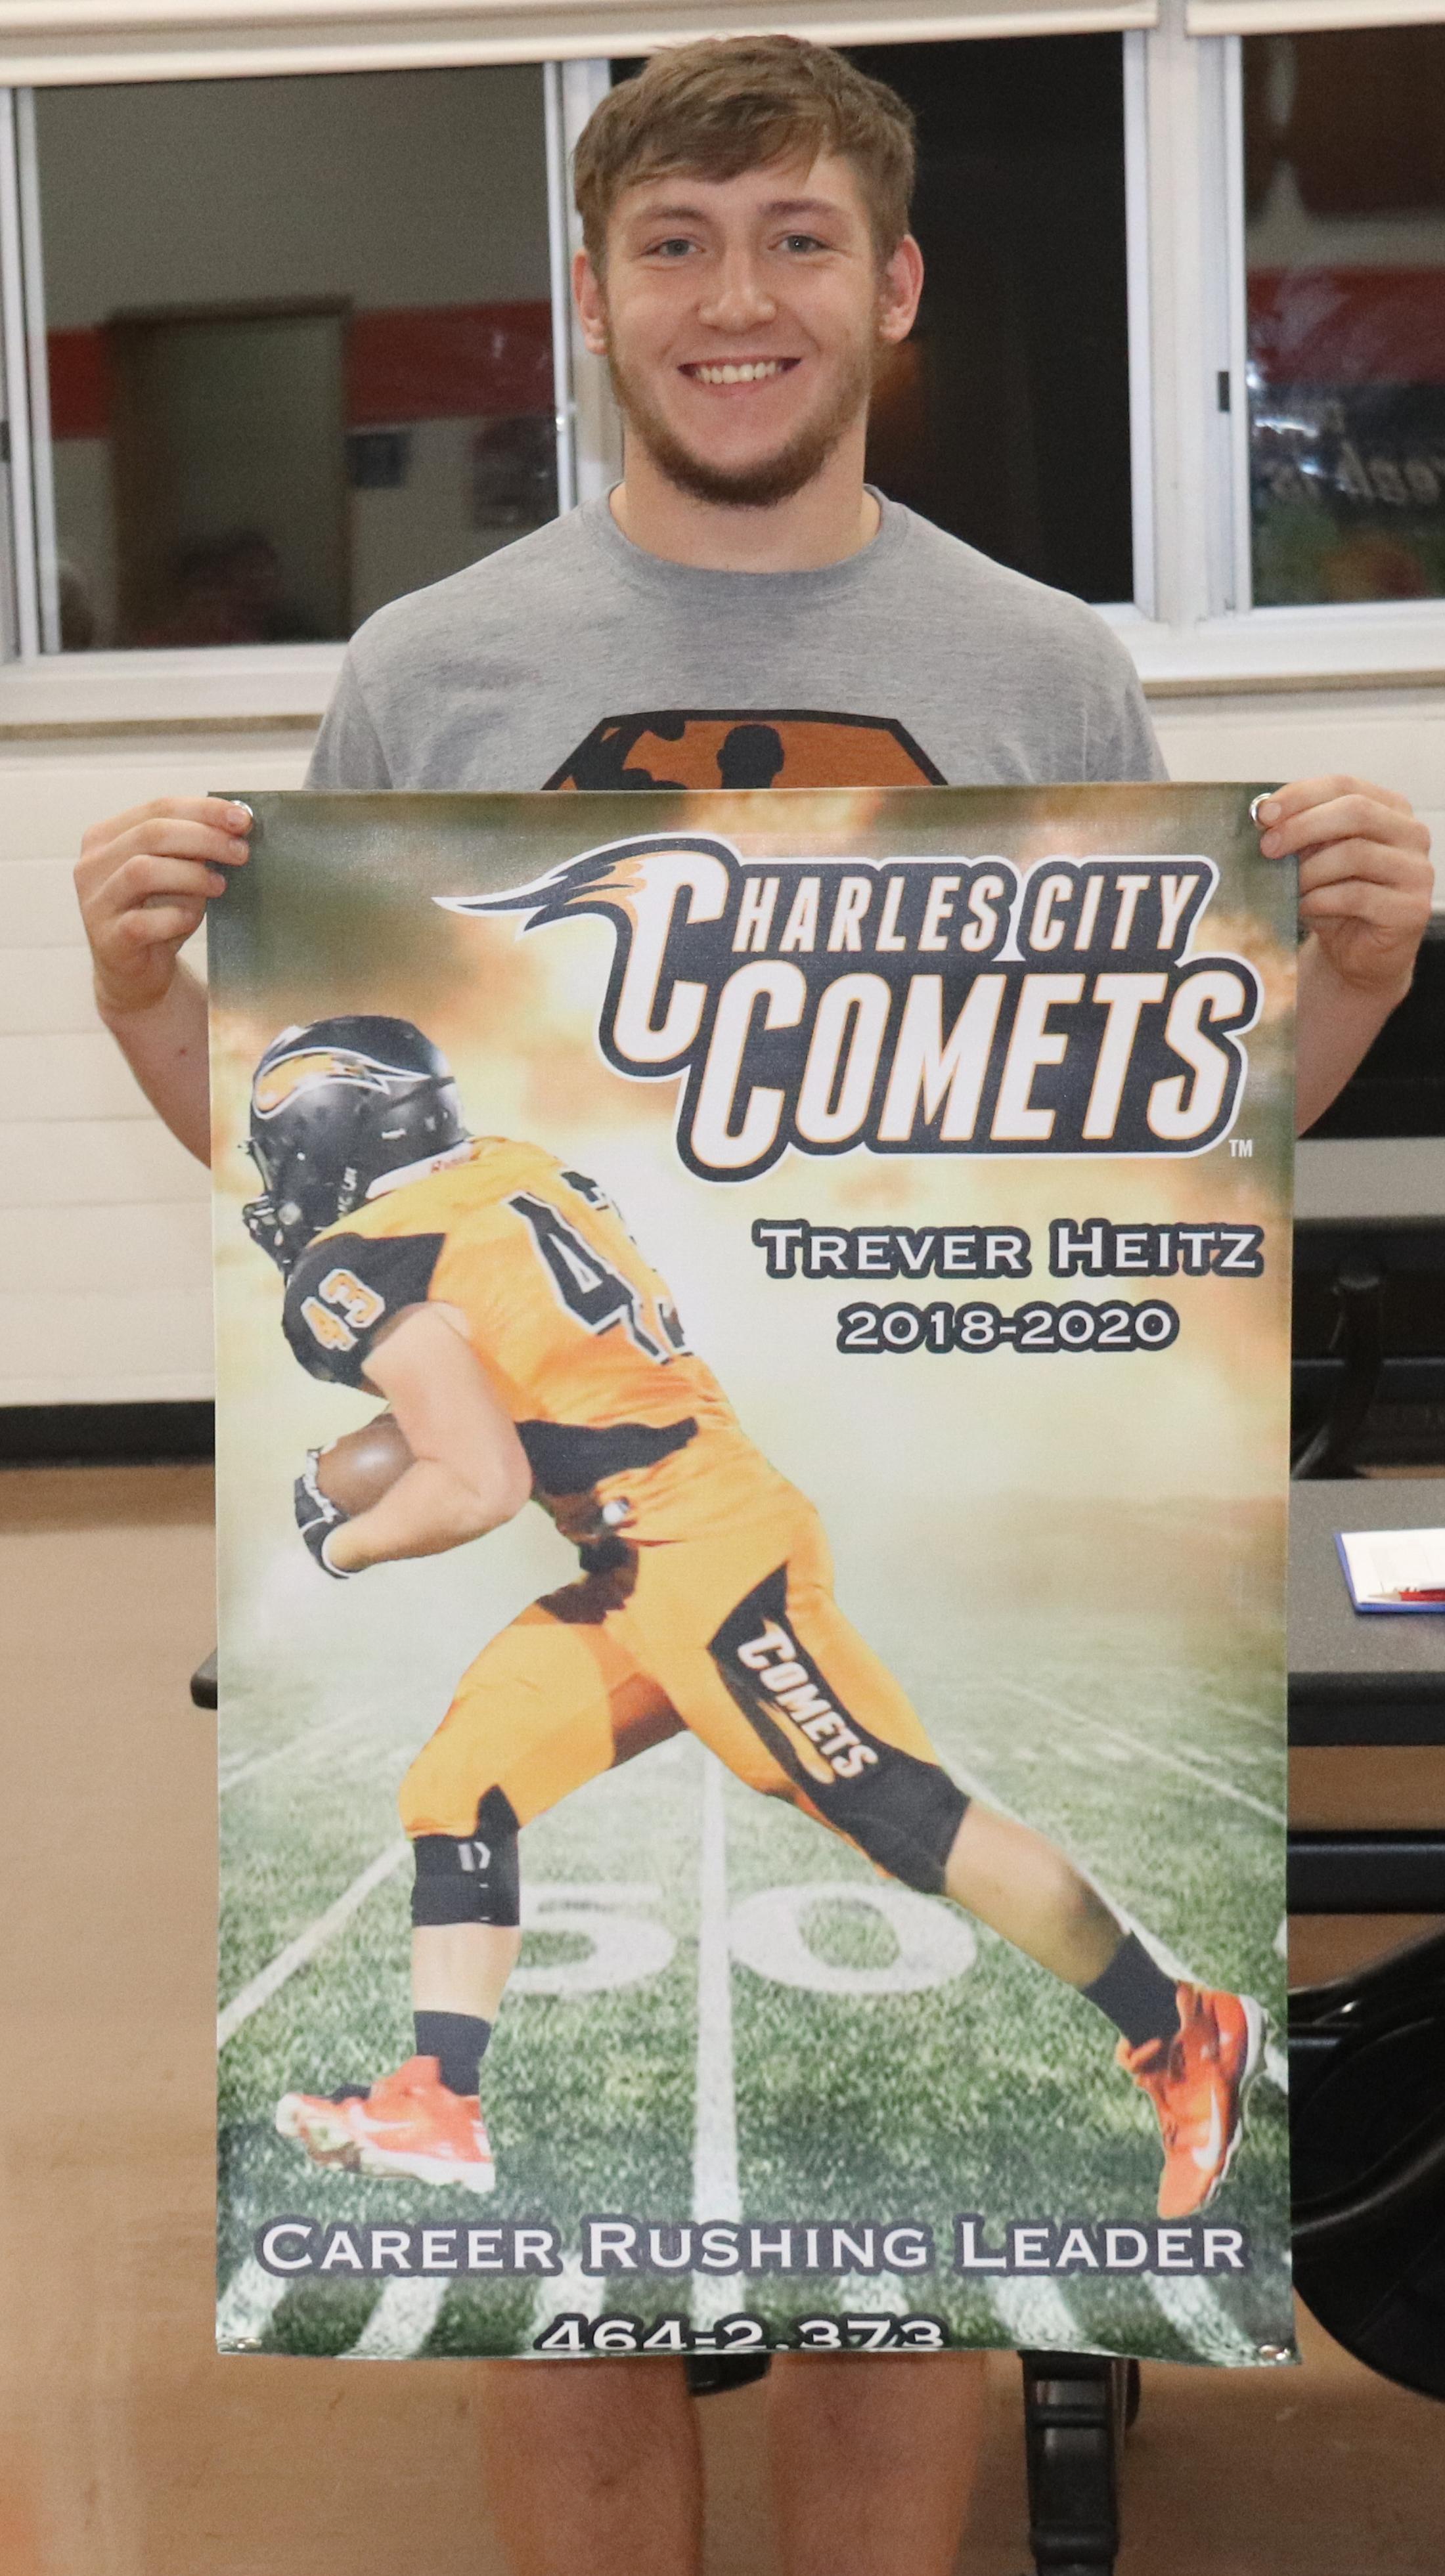 Comet football head coach steps down